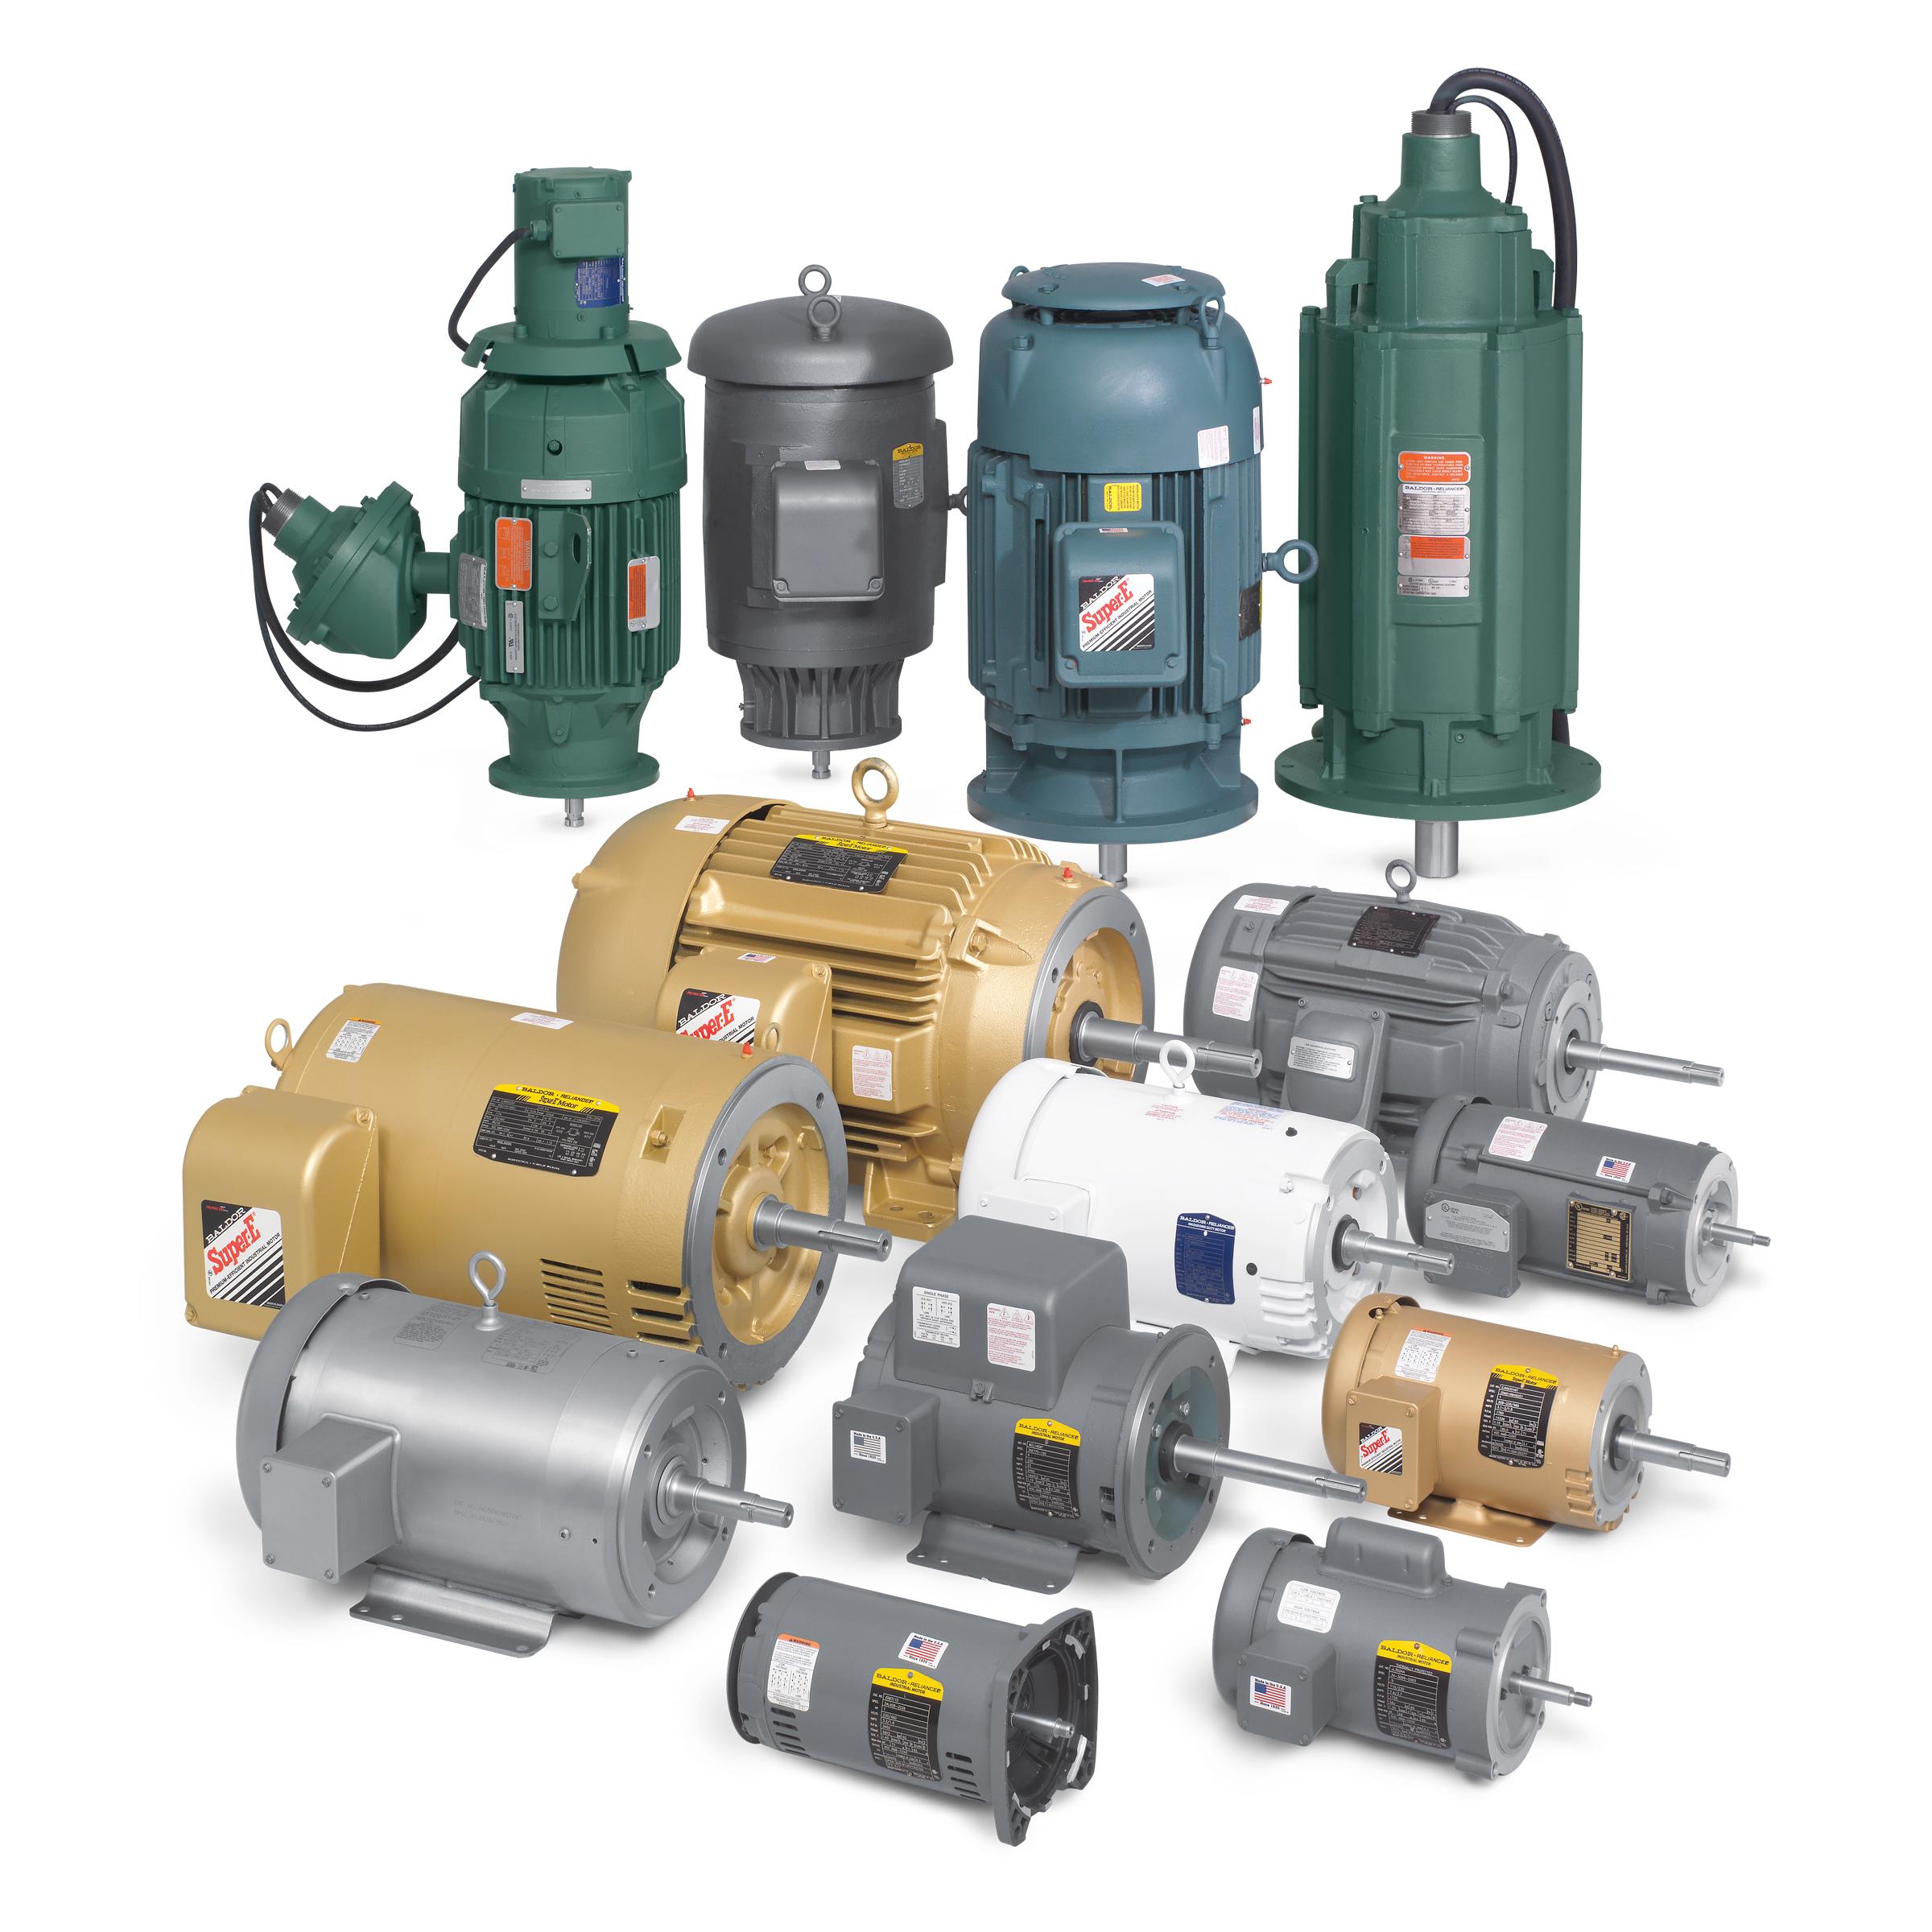 baldor reliance ac pump motor family.ashx?bc=white&as=1&w=1024 pump baldor com baldor reliance industrial motor wiring diagram at readyjetset.co